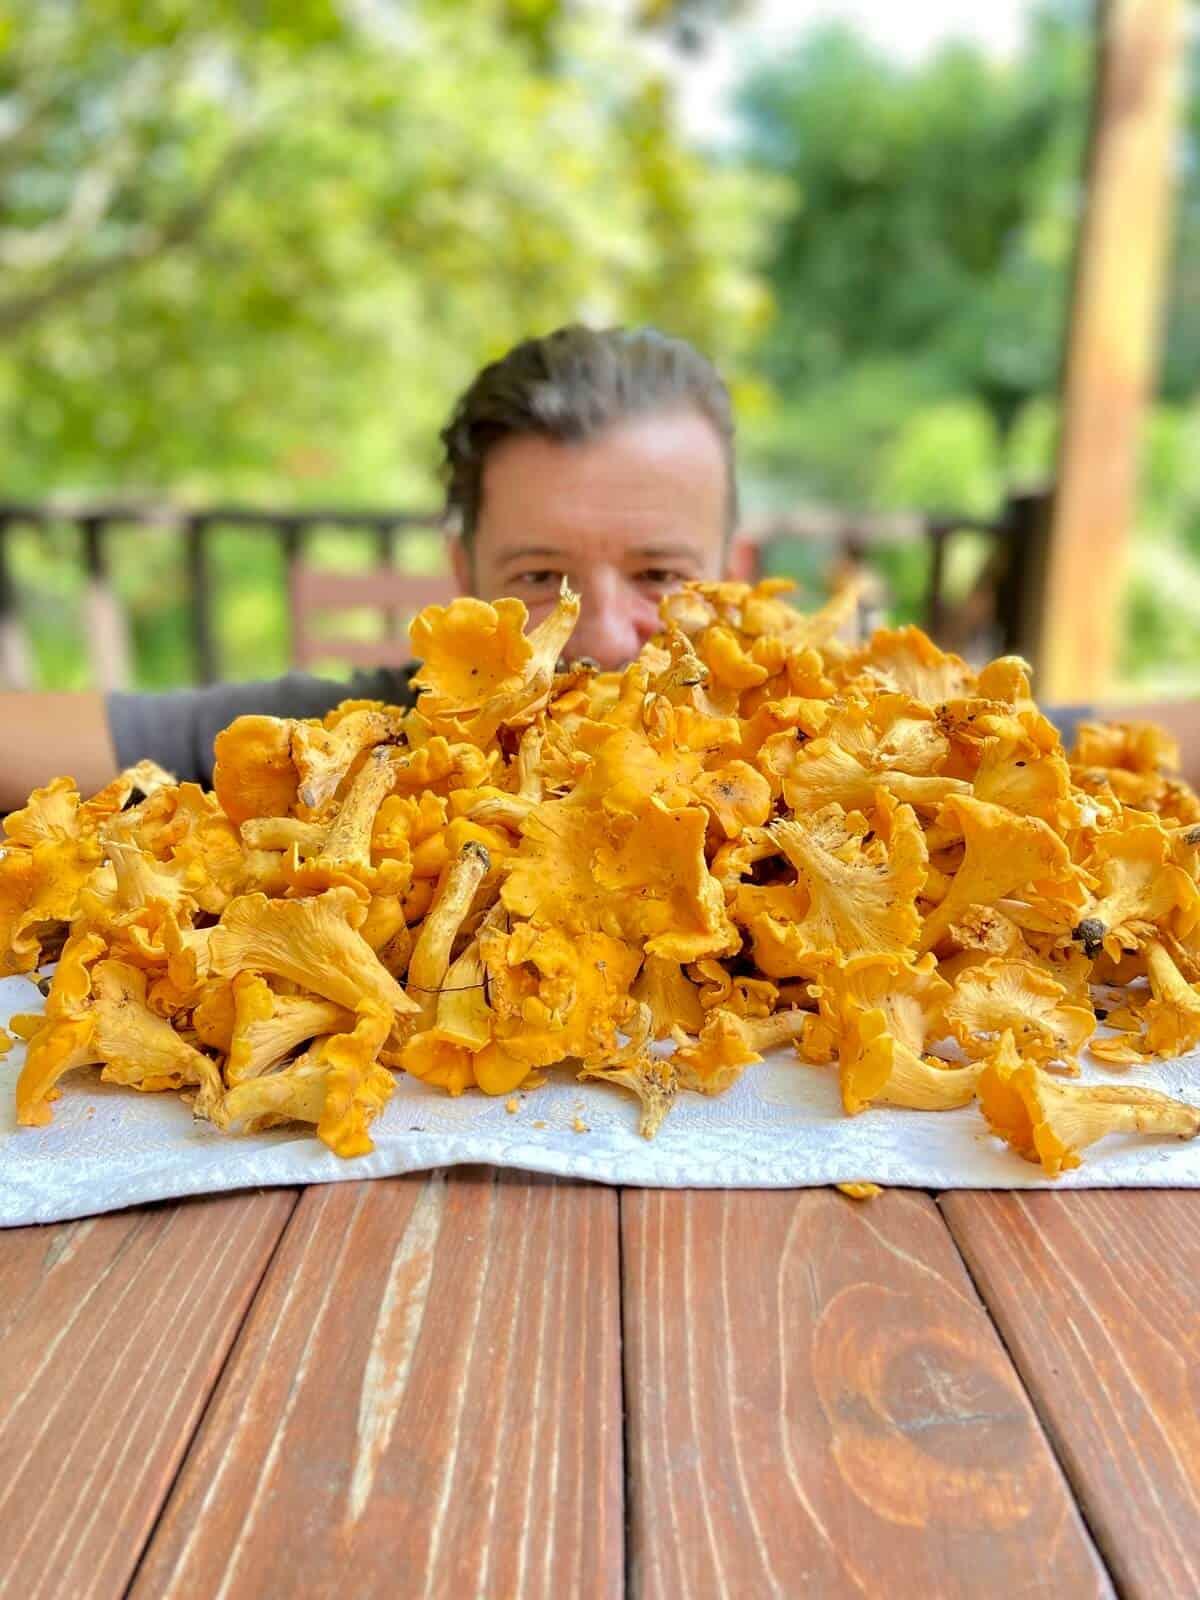 Mushroom Jerky Recipe (Photo by Viana Boenzli)